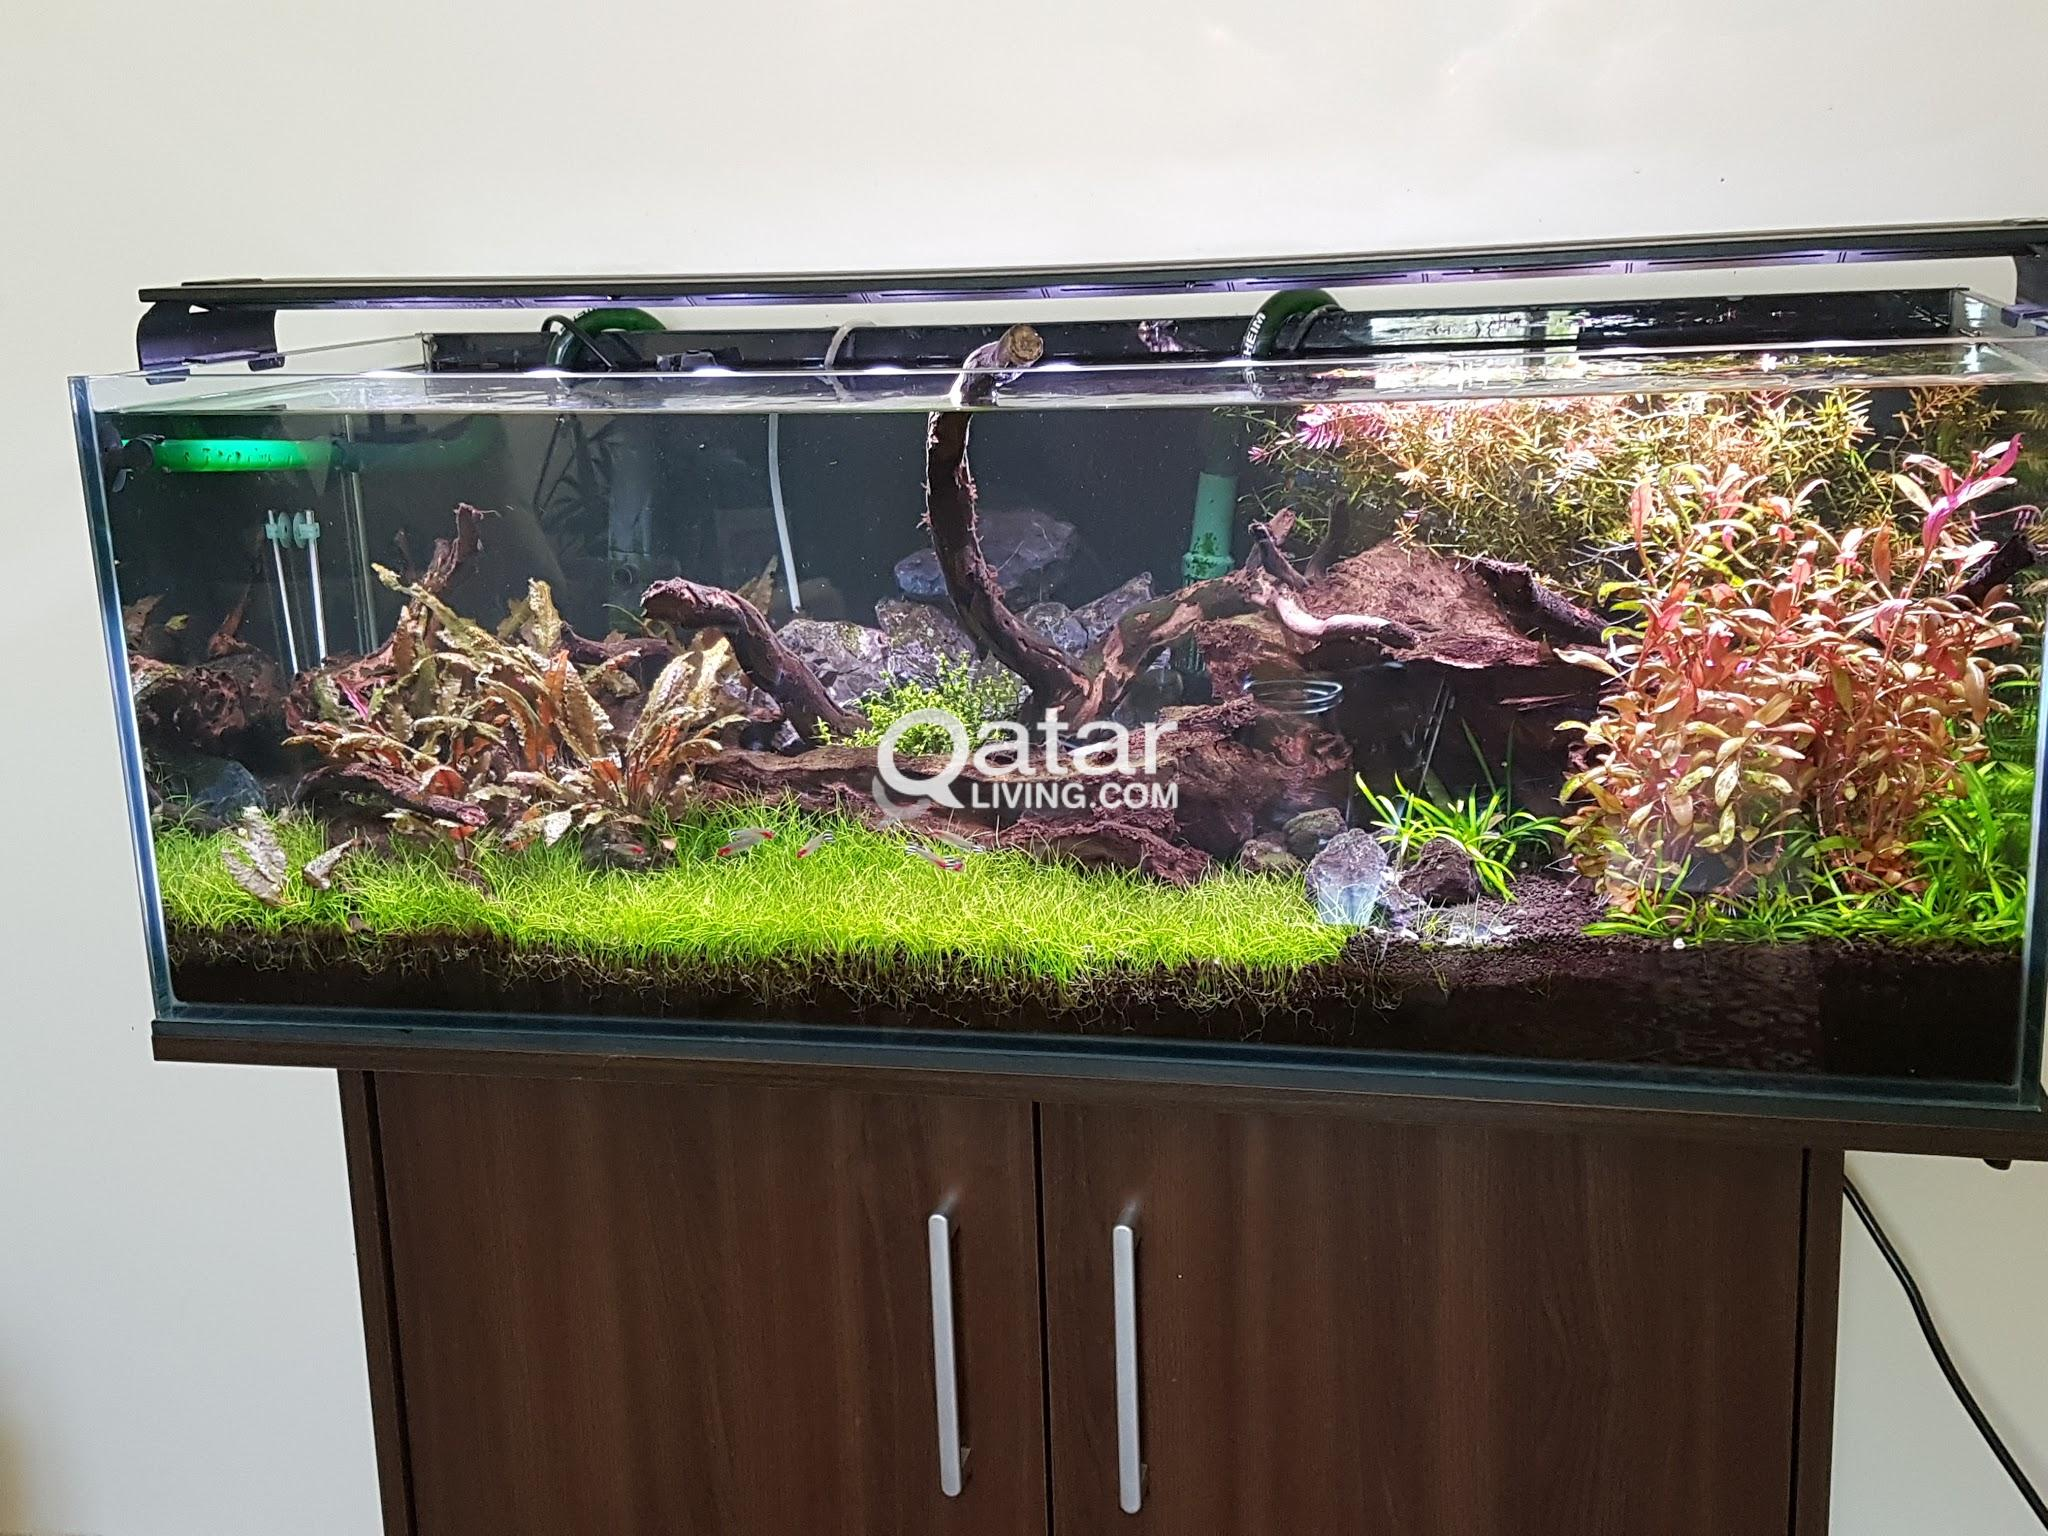 Planted Freshwater Aquarium Fish Tank 38 Gallon Complete Package Highest Grade Equipment Gorgeous Setup Qatar Living